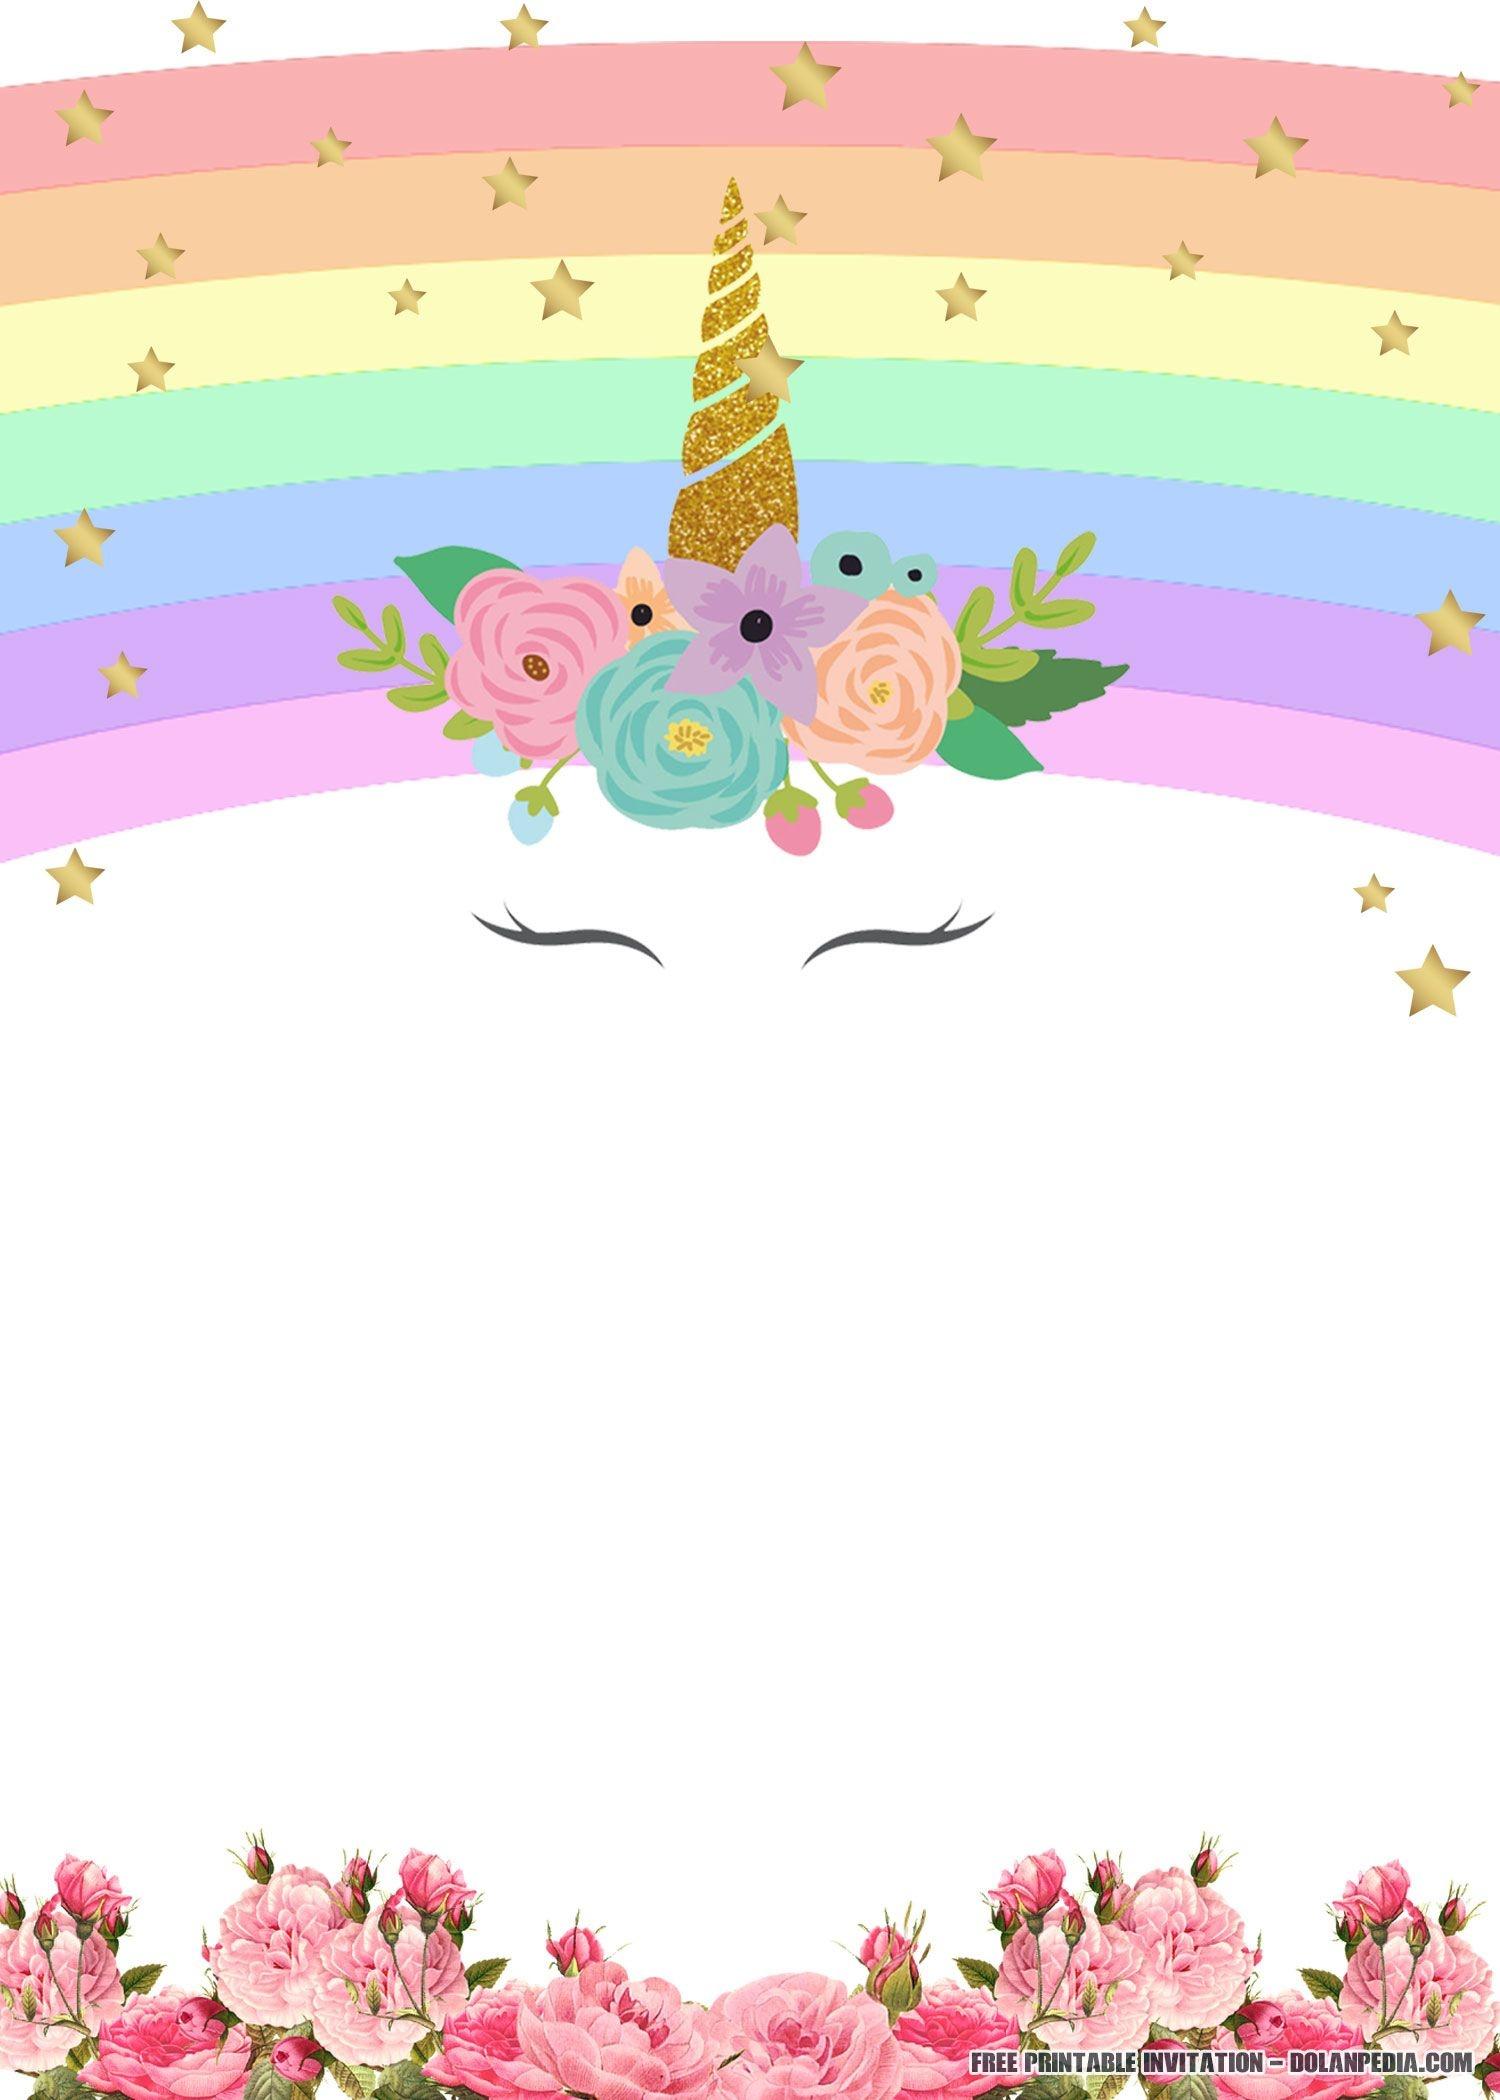 Free Printable Golden Unicorn Birthday Invitation Template | Unicorn - Free Printable Invitations